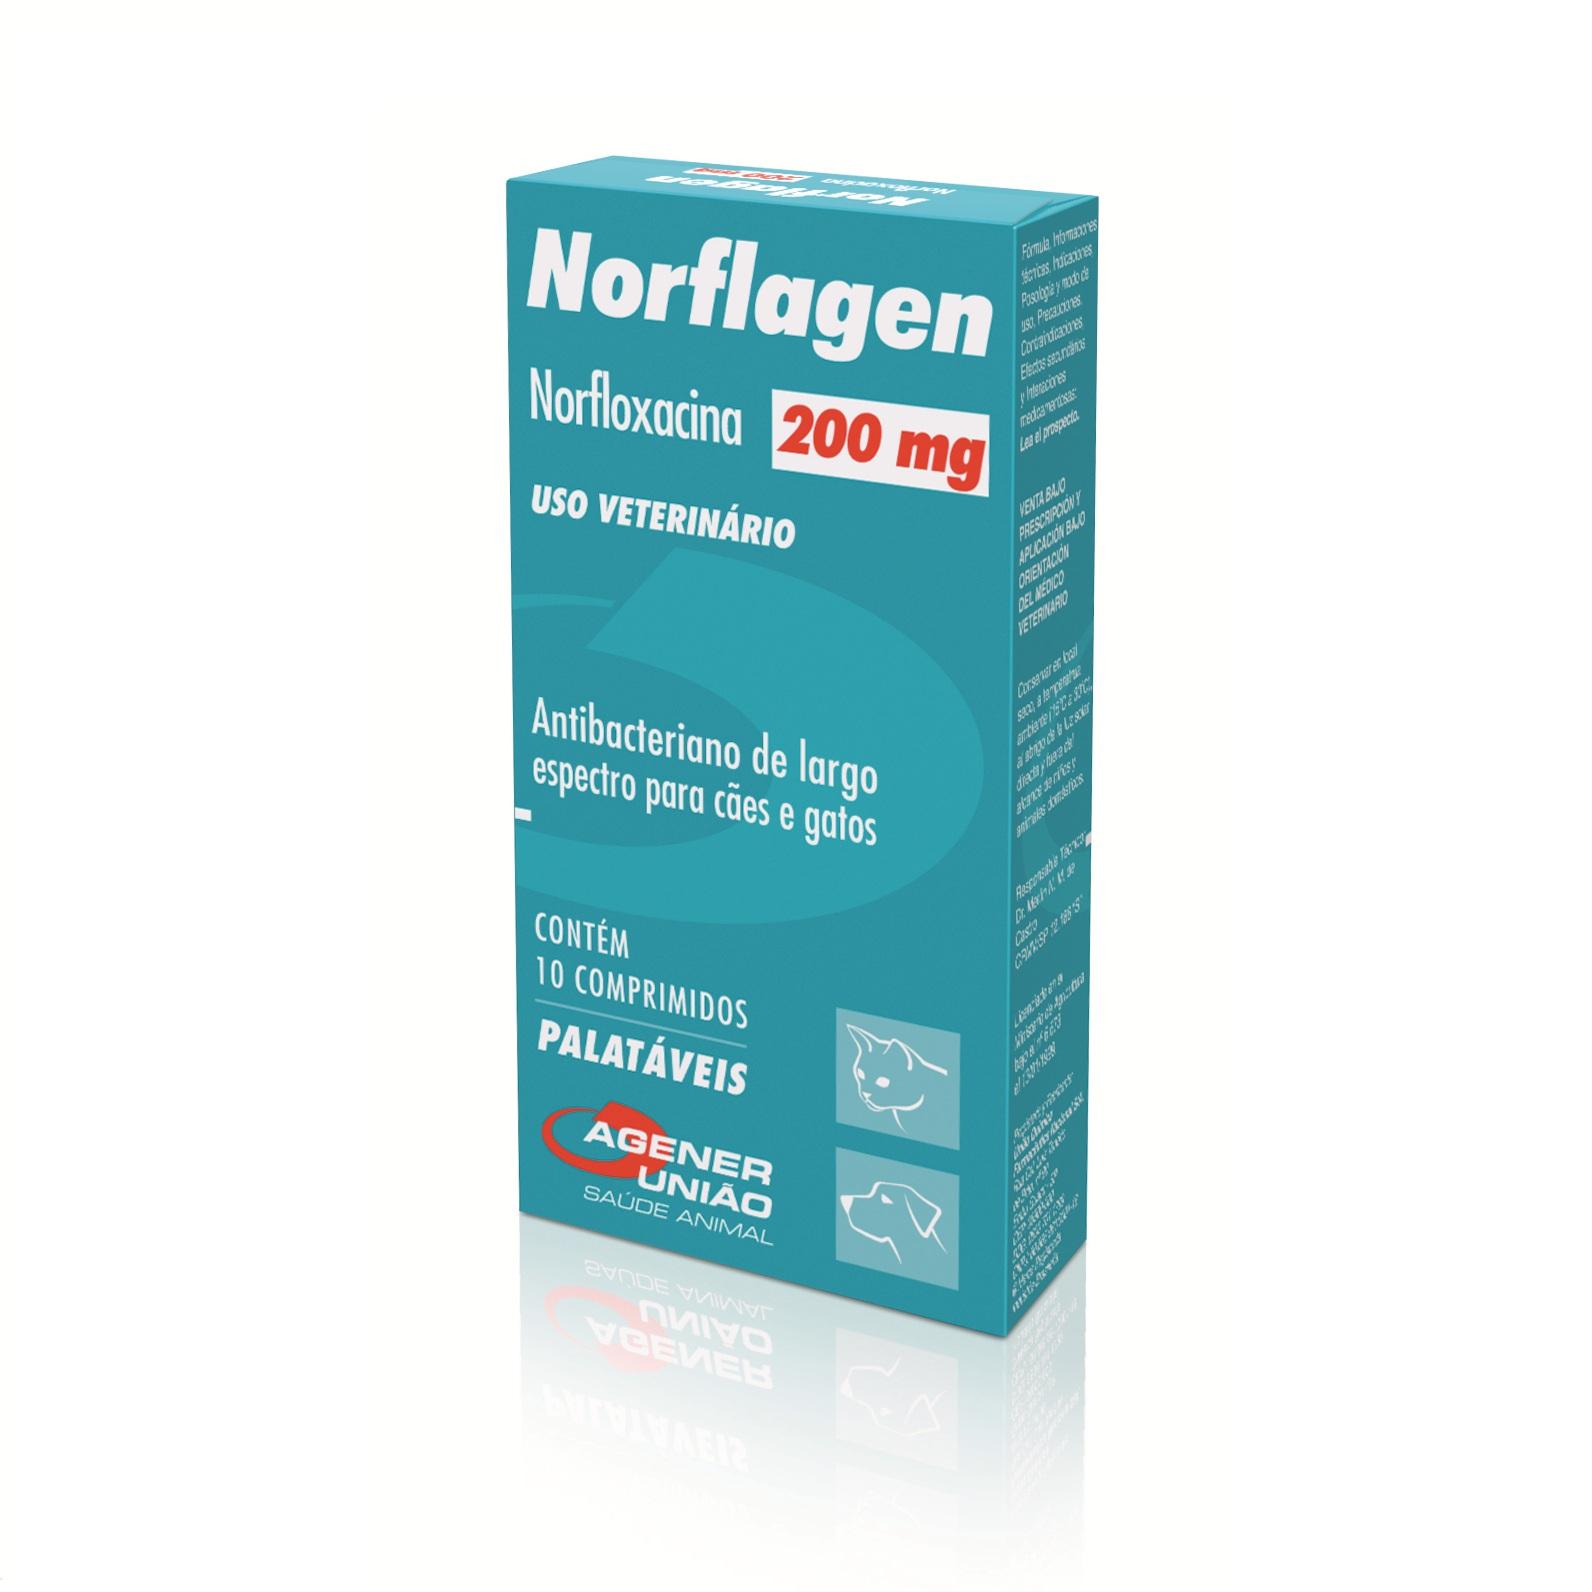 Antibacteriano Norflagen 200 mg - Agener União